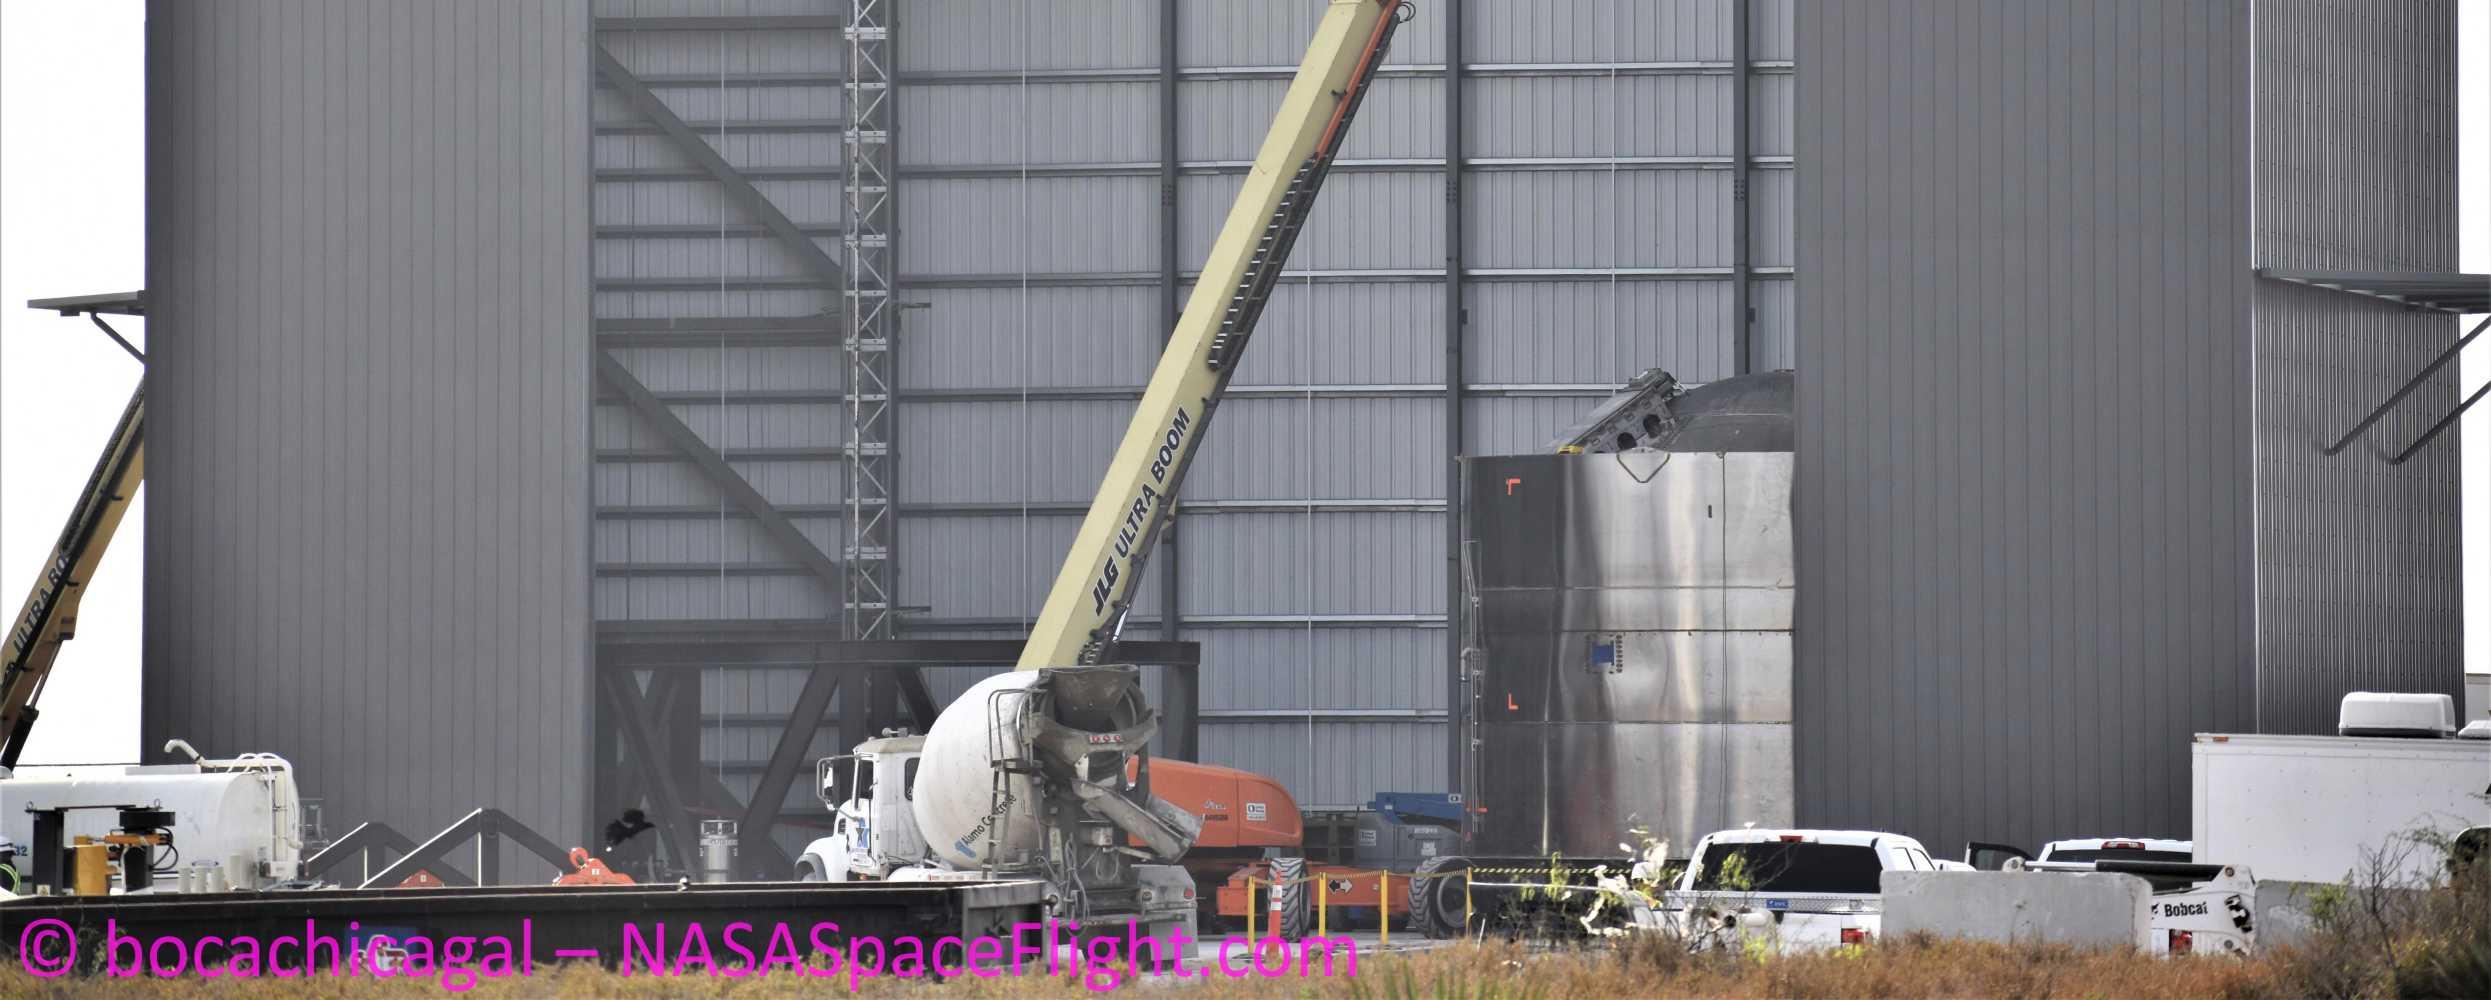 Starship Boca Chica 031620 (NASASpaceflight – bocachicagal) SN03 + VAB elevator 1 crop (c)